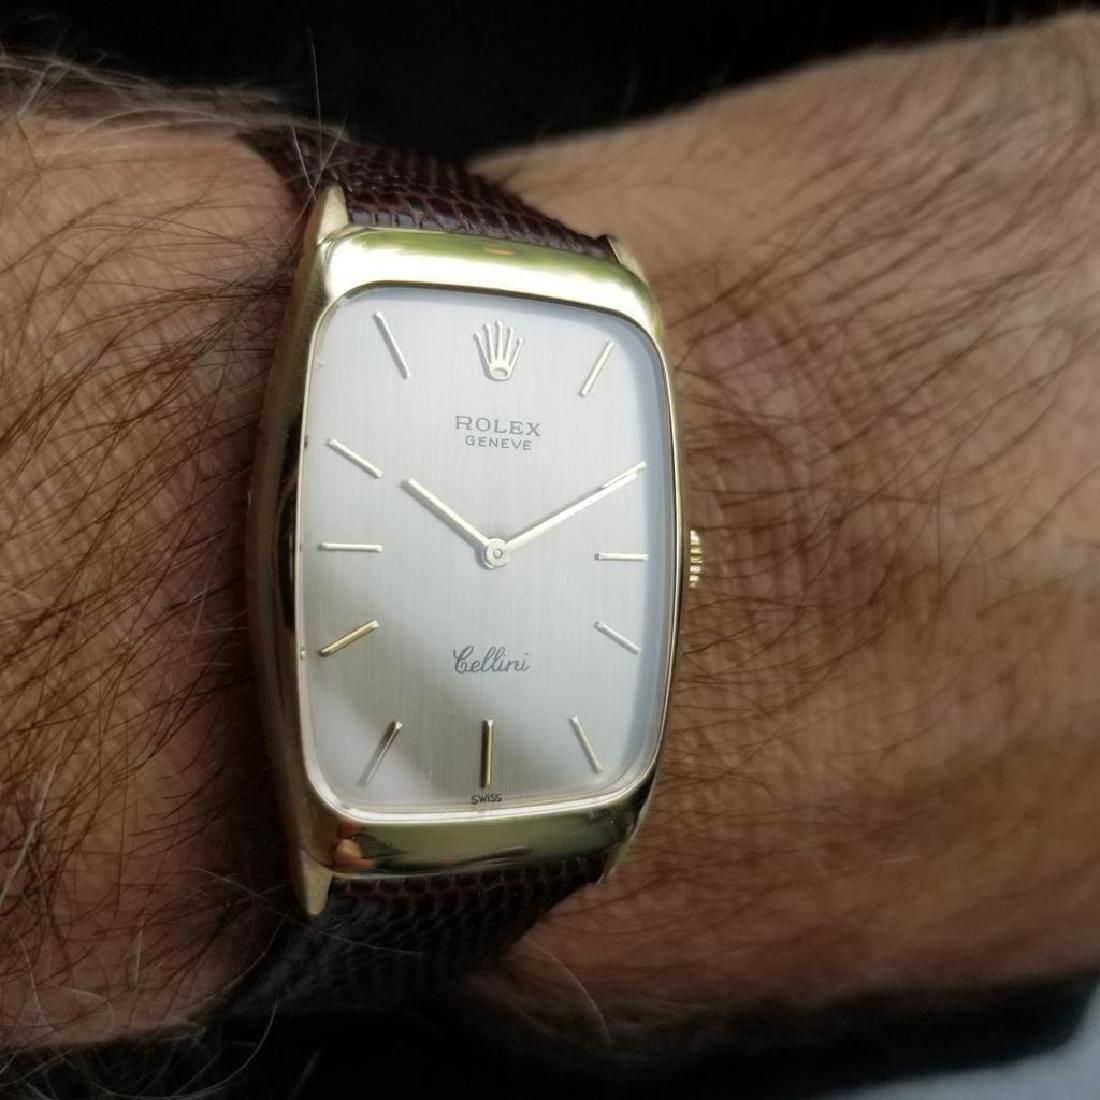 ROLEX Men's 18K Gold Cellini 4136 Hand-Wind Dress Watch - 10